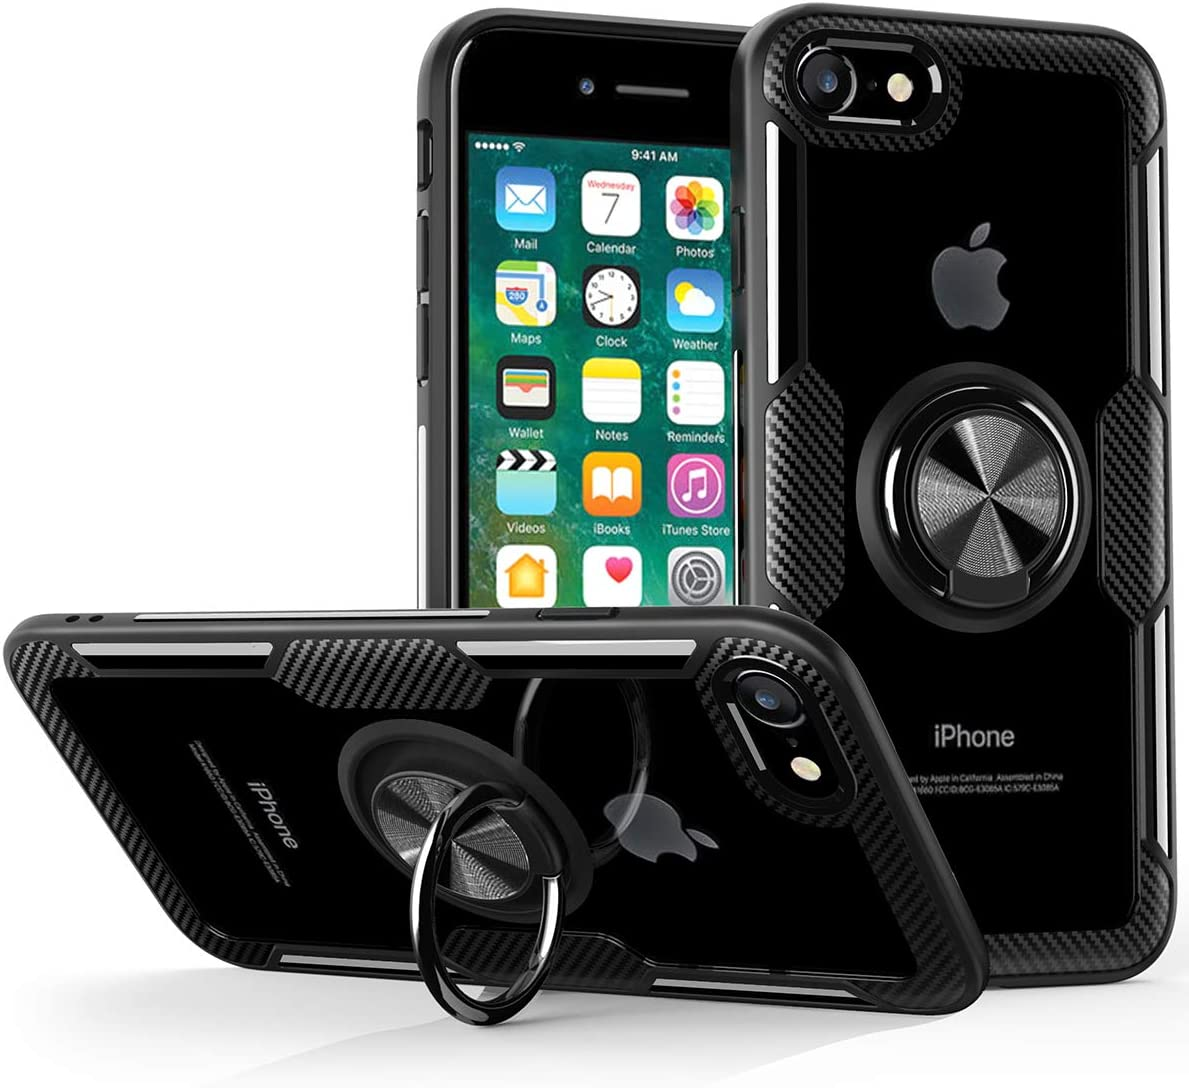 iPhone SE 2020 Case, iPhone 8 Case, iPhone 7 Case,Crystal Clear Carbon Fiber Design Armor Protective Case with 360 Degree Rotation Finger Ring Grip Holder Kickstand for Apple iPhoneSE 2/8/7,Black